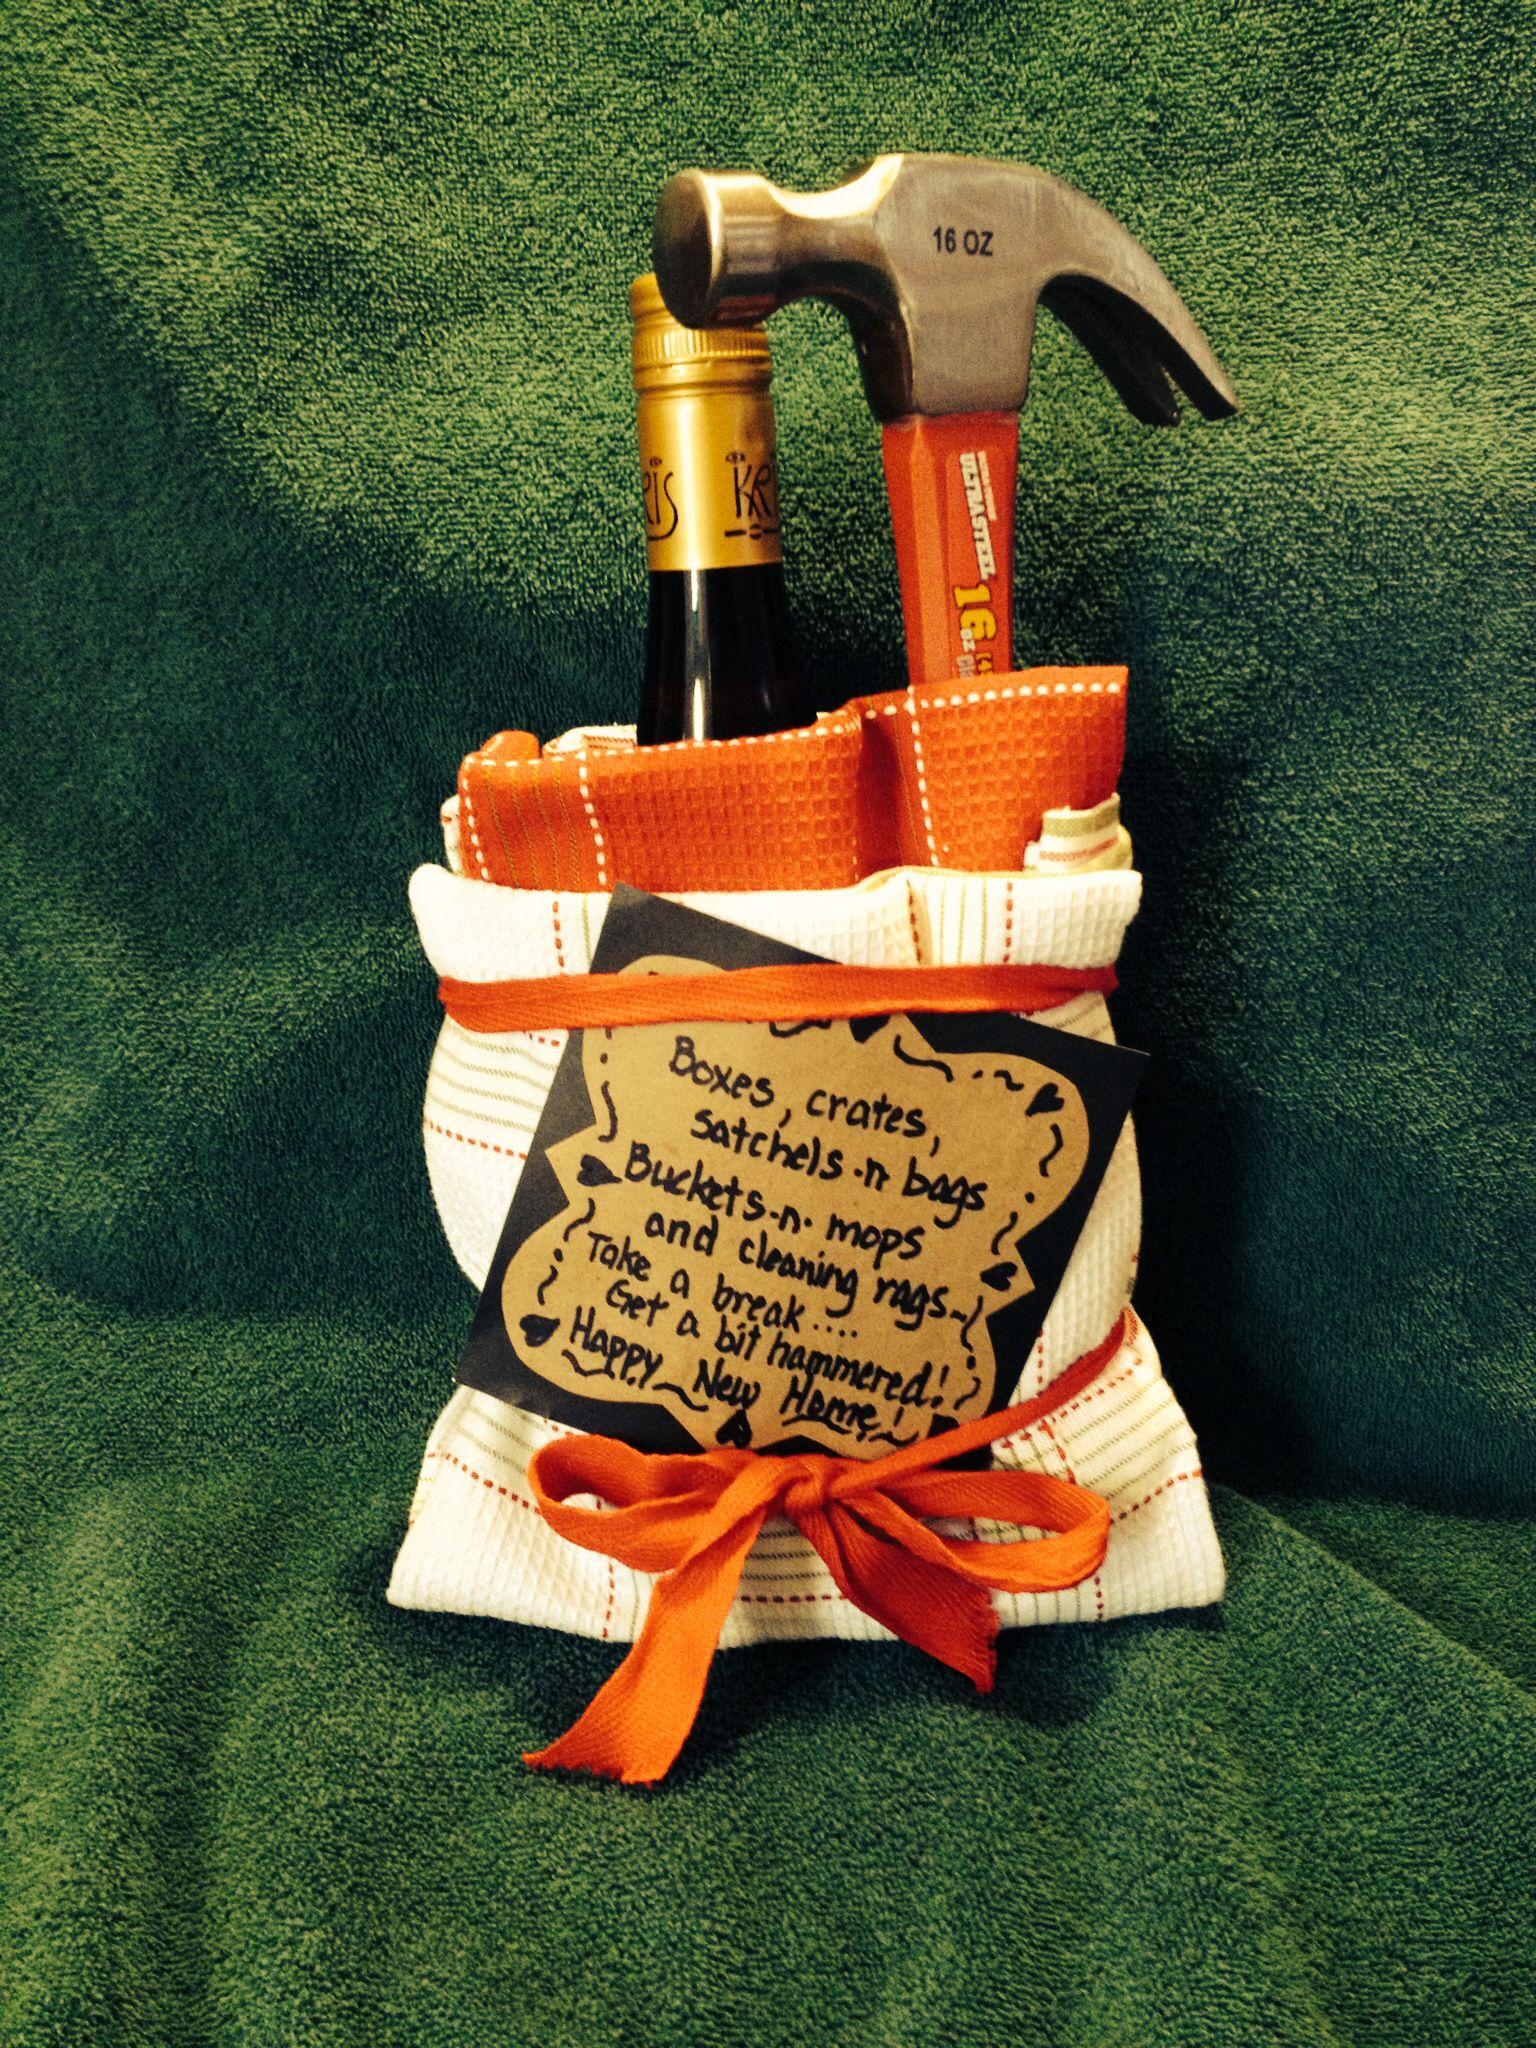 Housewarming gift ideas pinterest for Home warming gift ideas